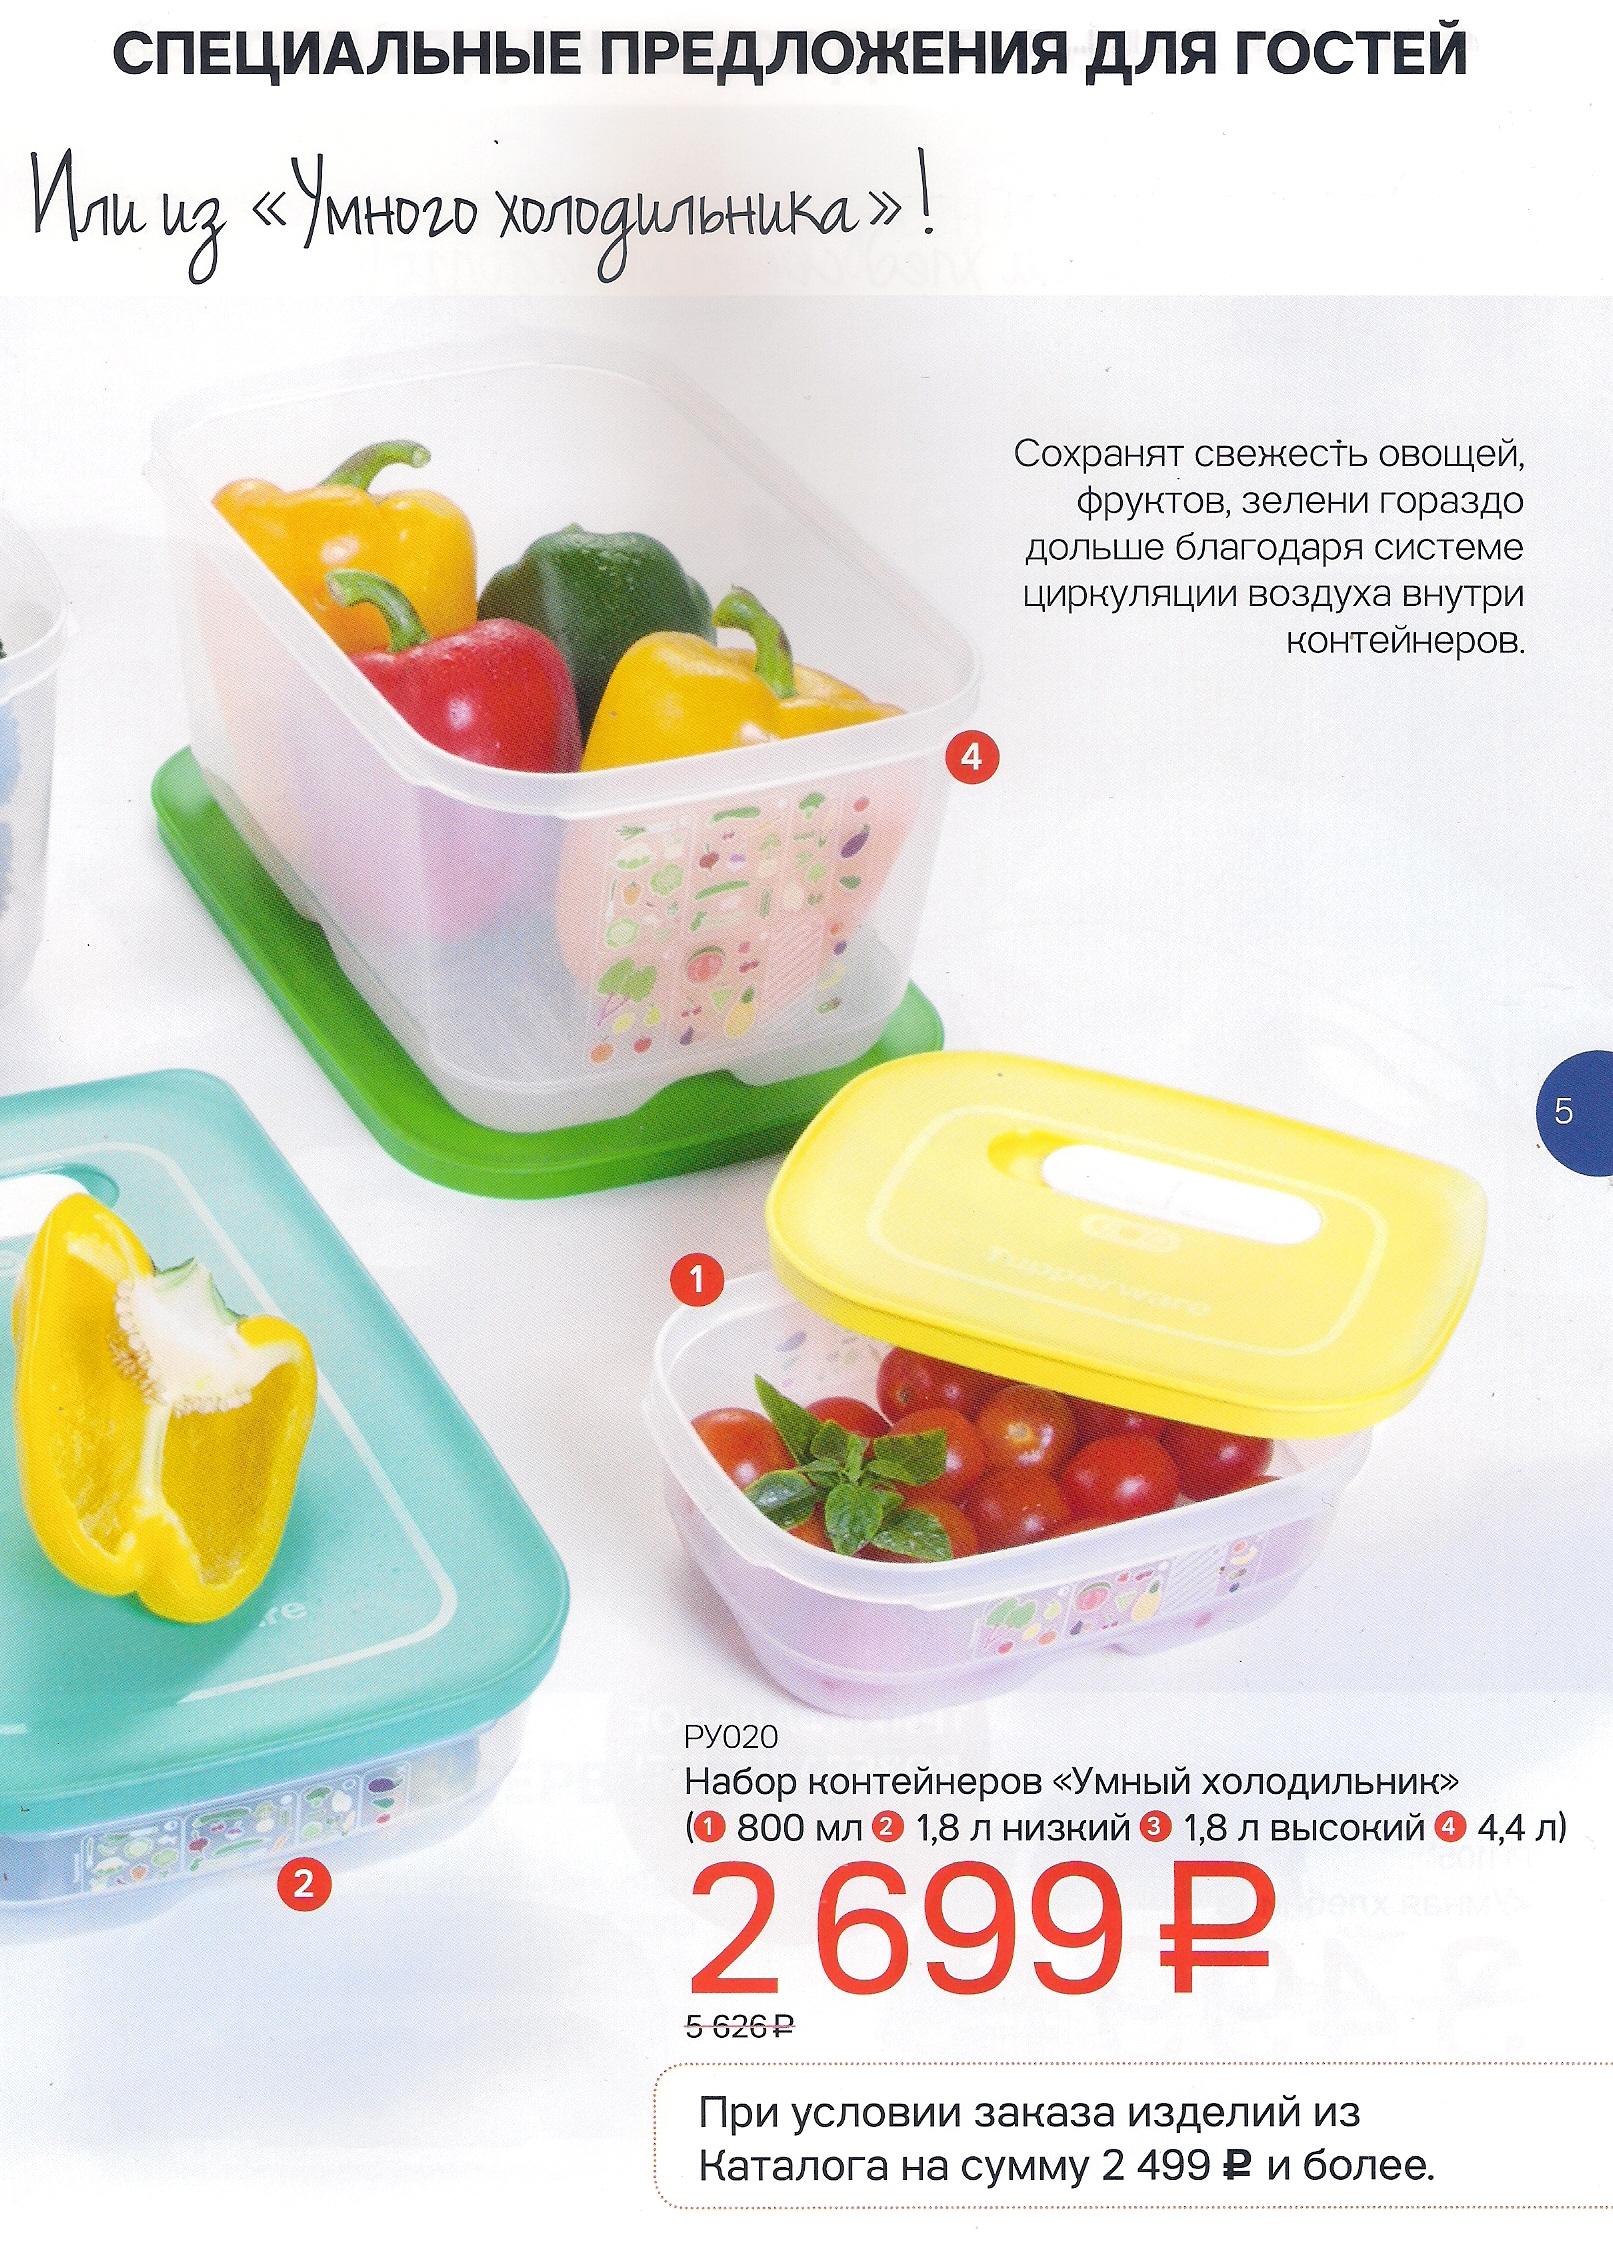 http://tupperware-online.ru/images/upload/4l.jpg